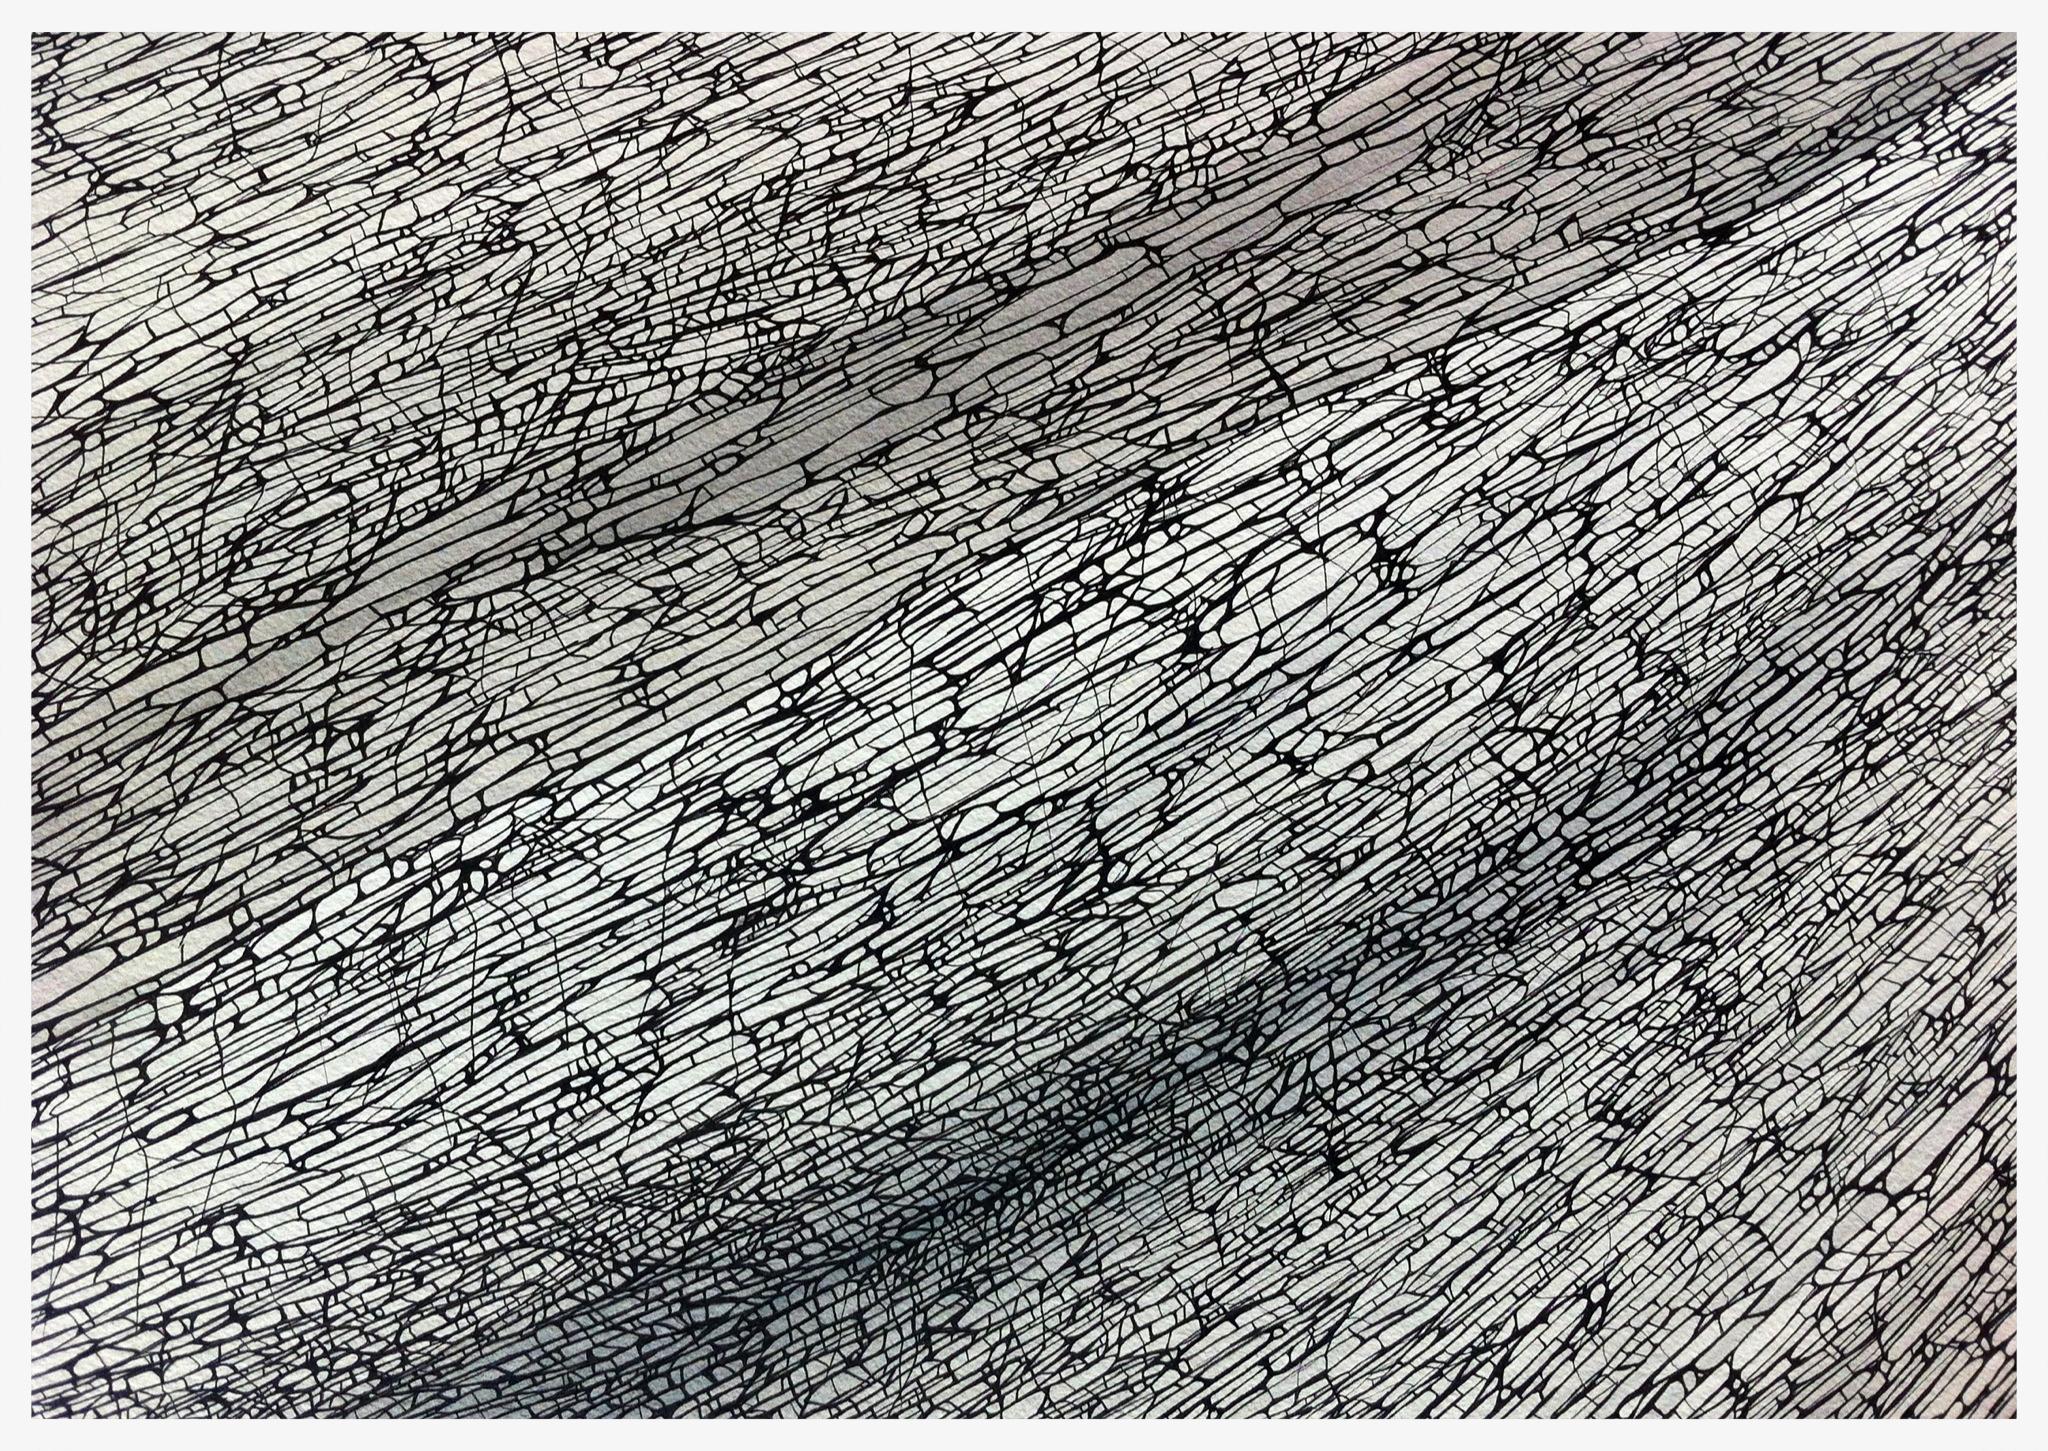 Divergence - Study 2 ©ANTHONY WIGGLESWORTH 2015  Ink on Paper -56 cm x 76 cm  anthonysart.com